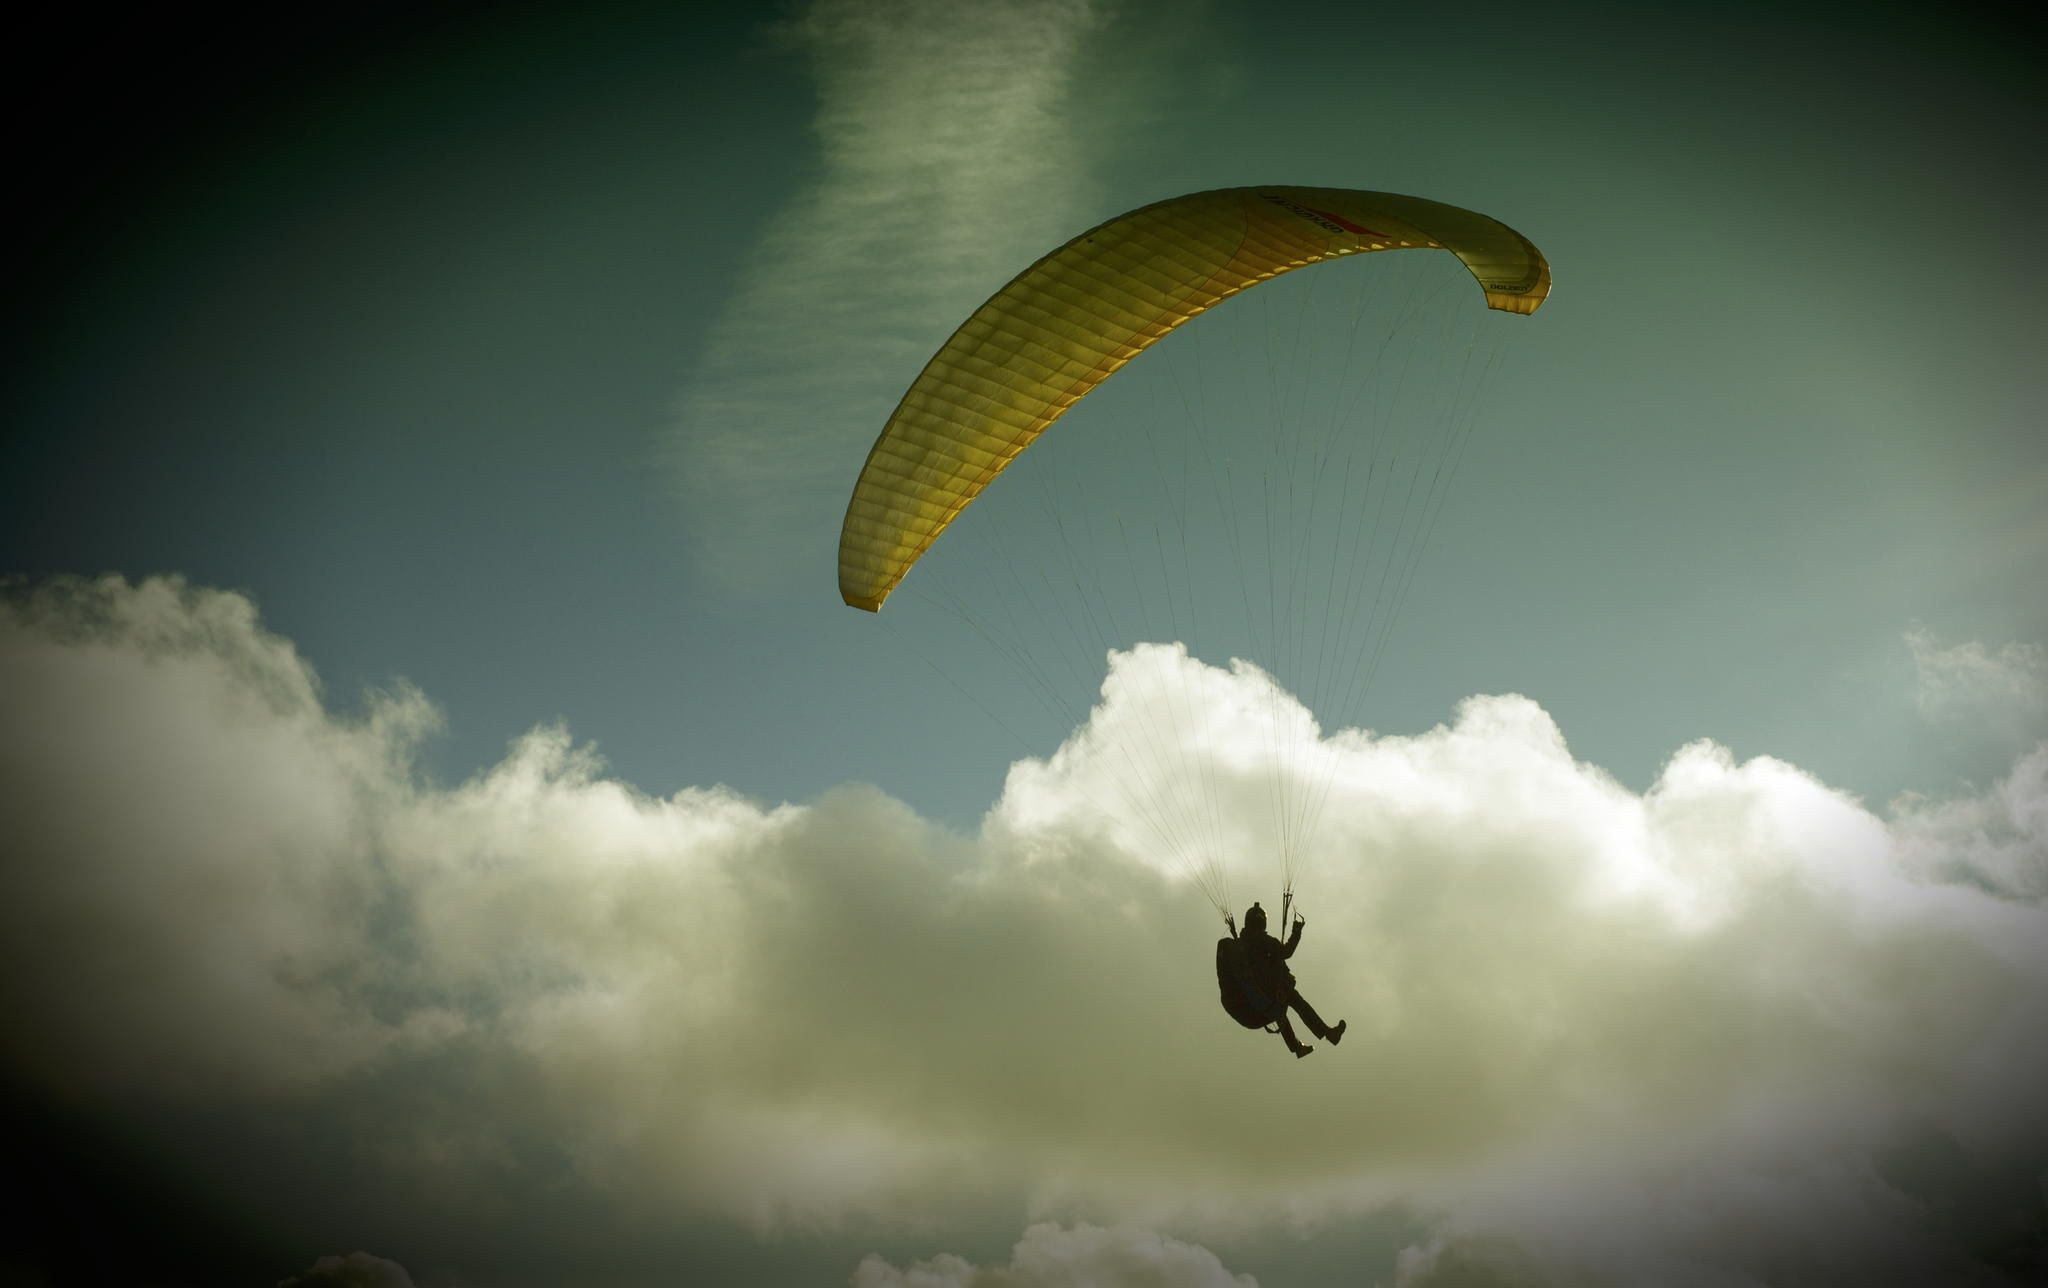 Photograph Parascender12 by Ian Docherty on 500px